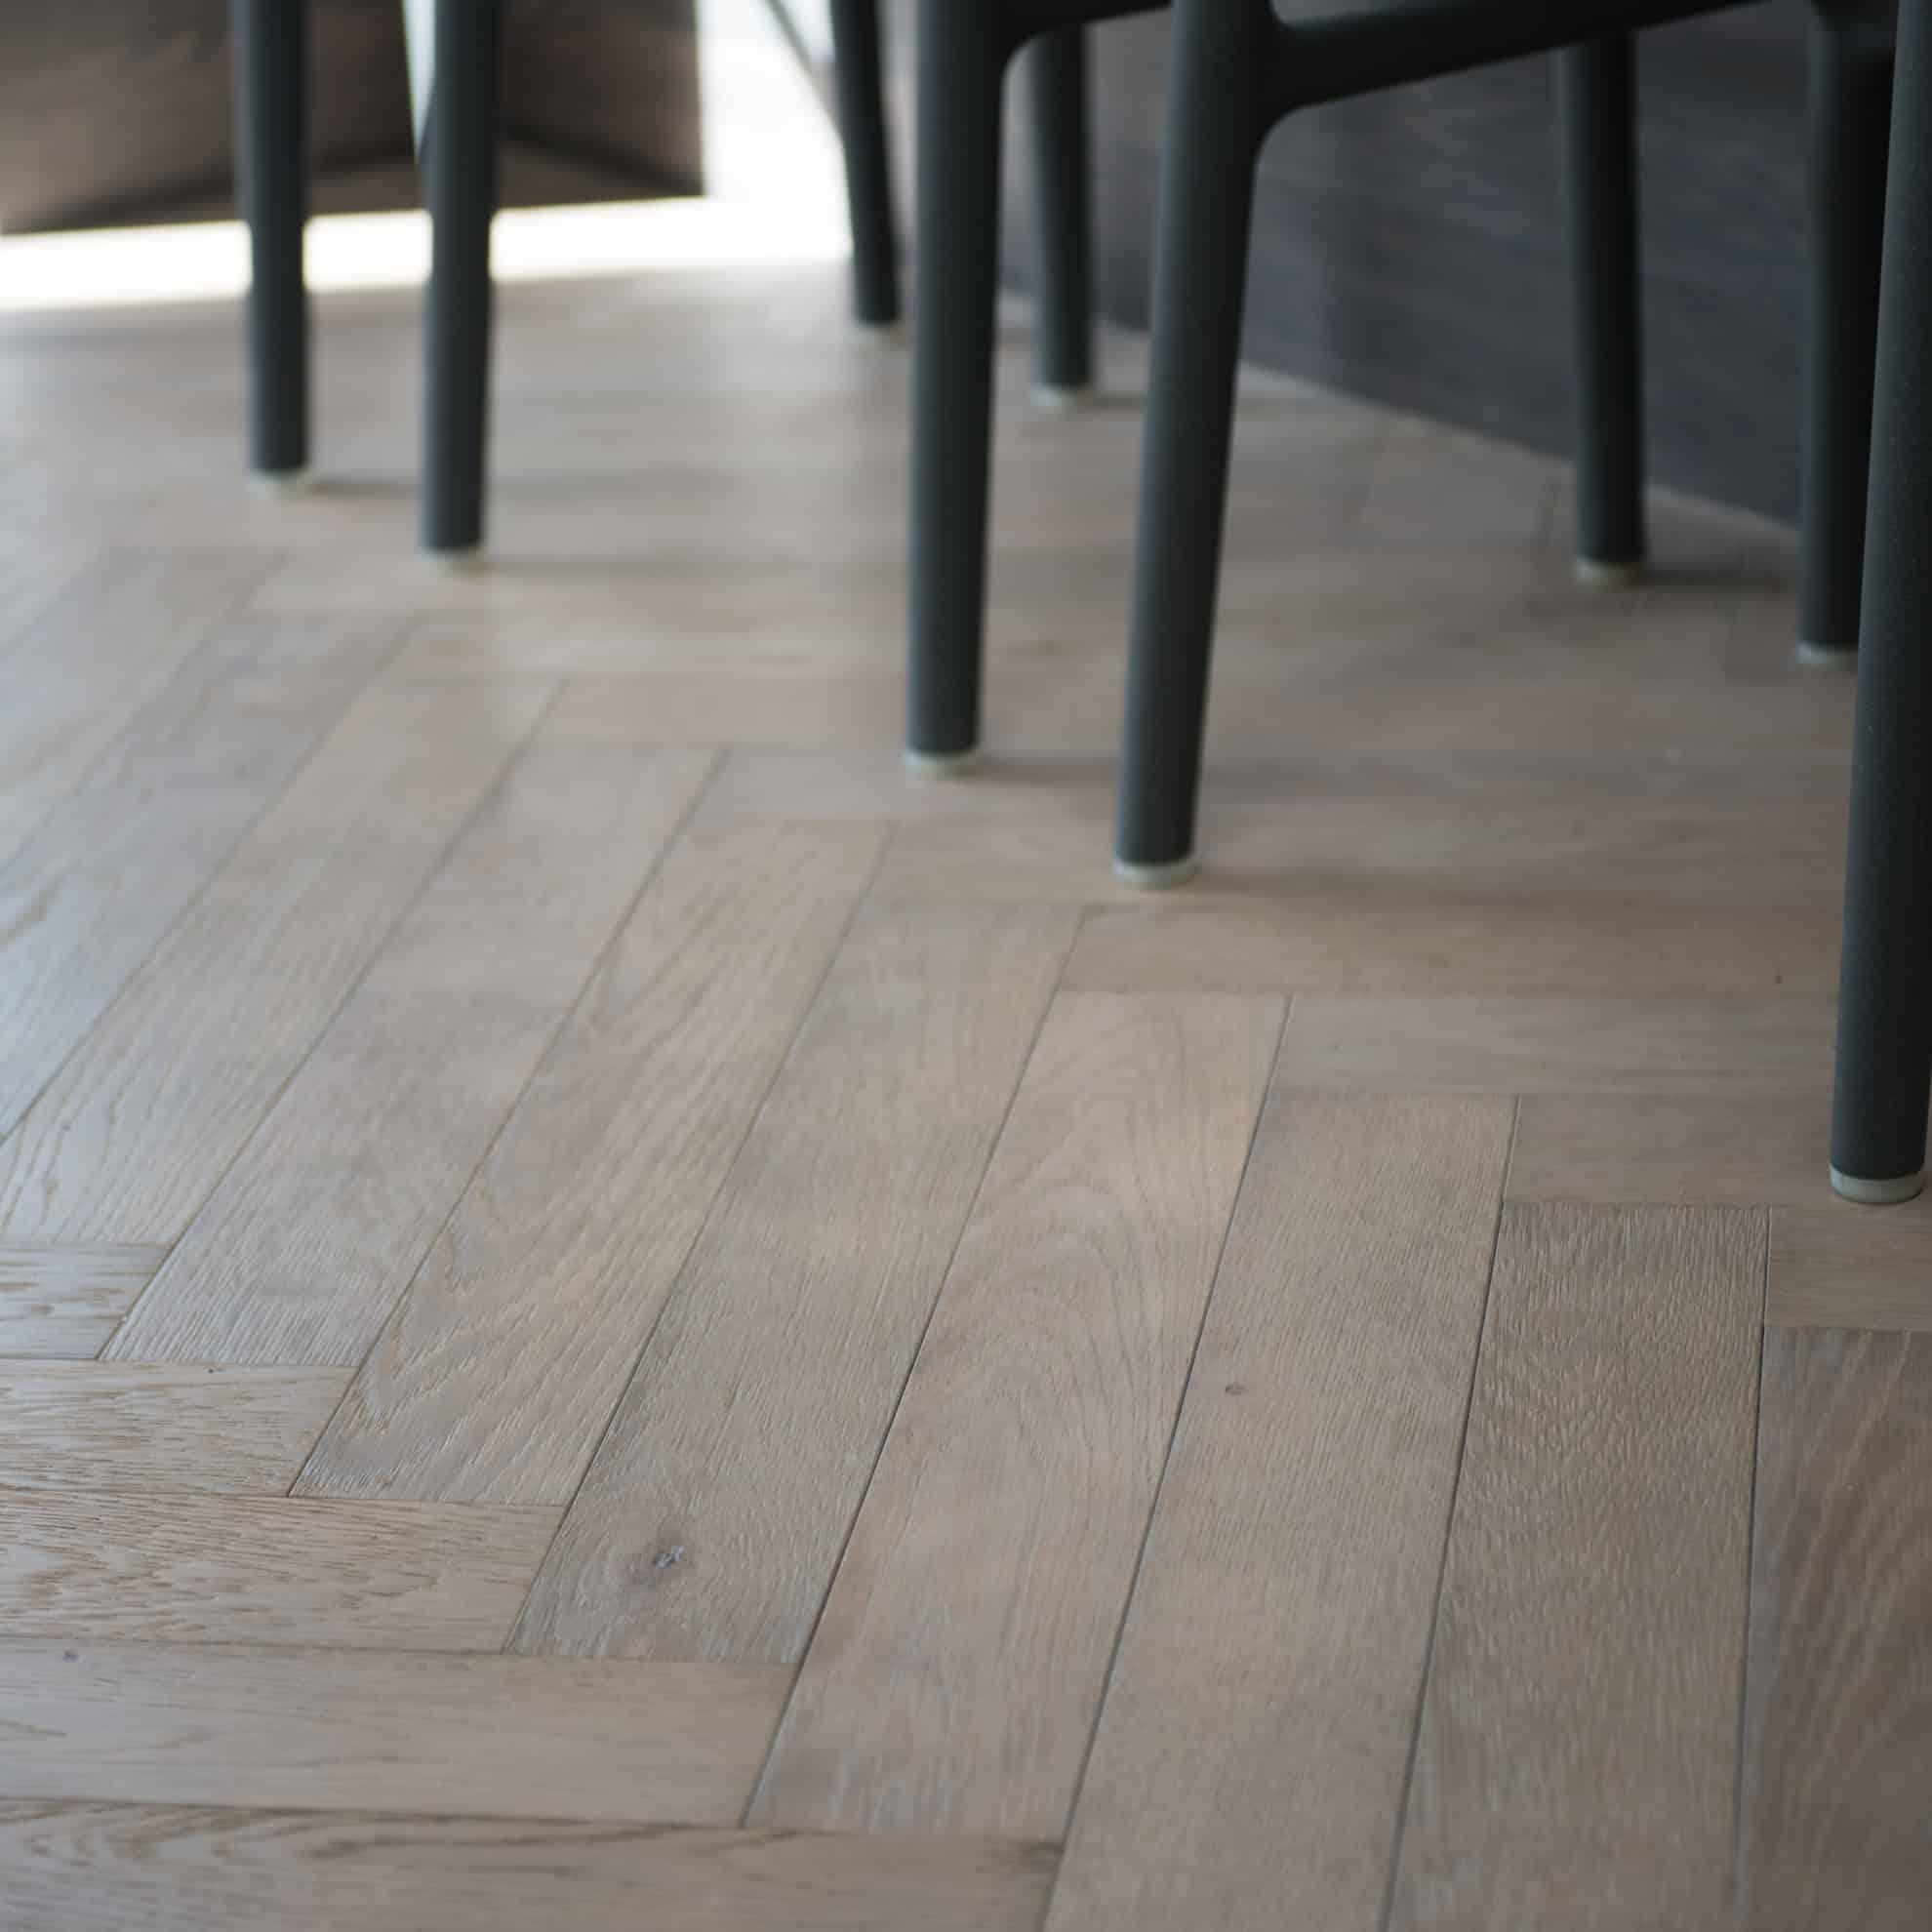 Hard Wearing Dominica Oak Herringbone Flooring in Kitchen